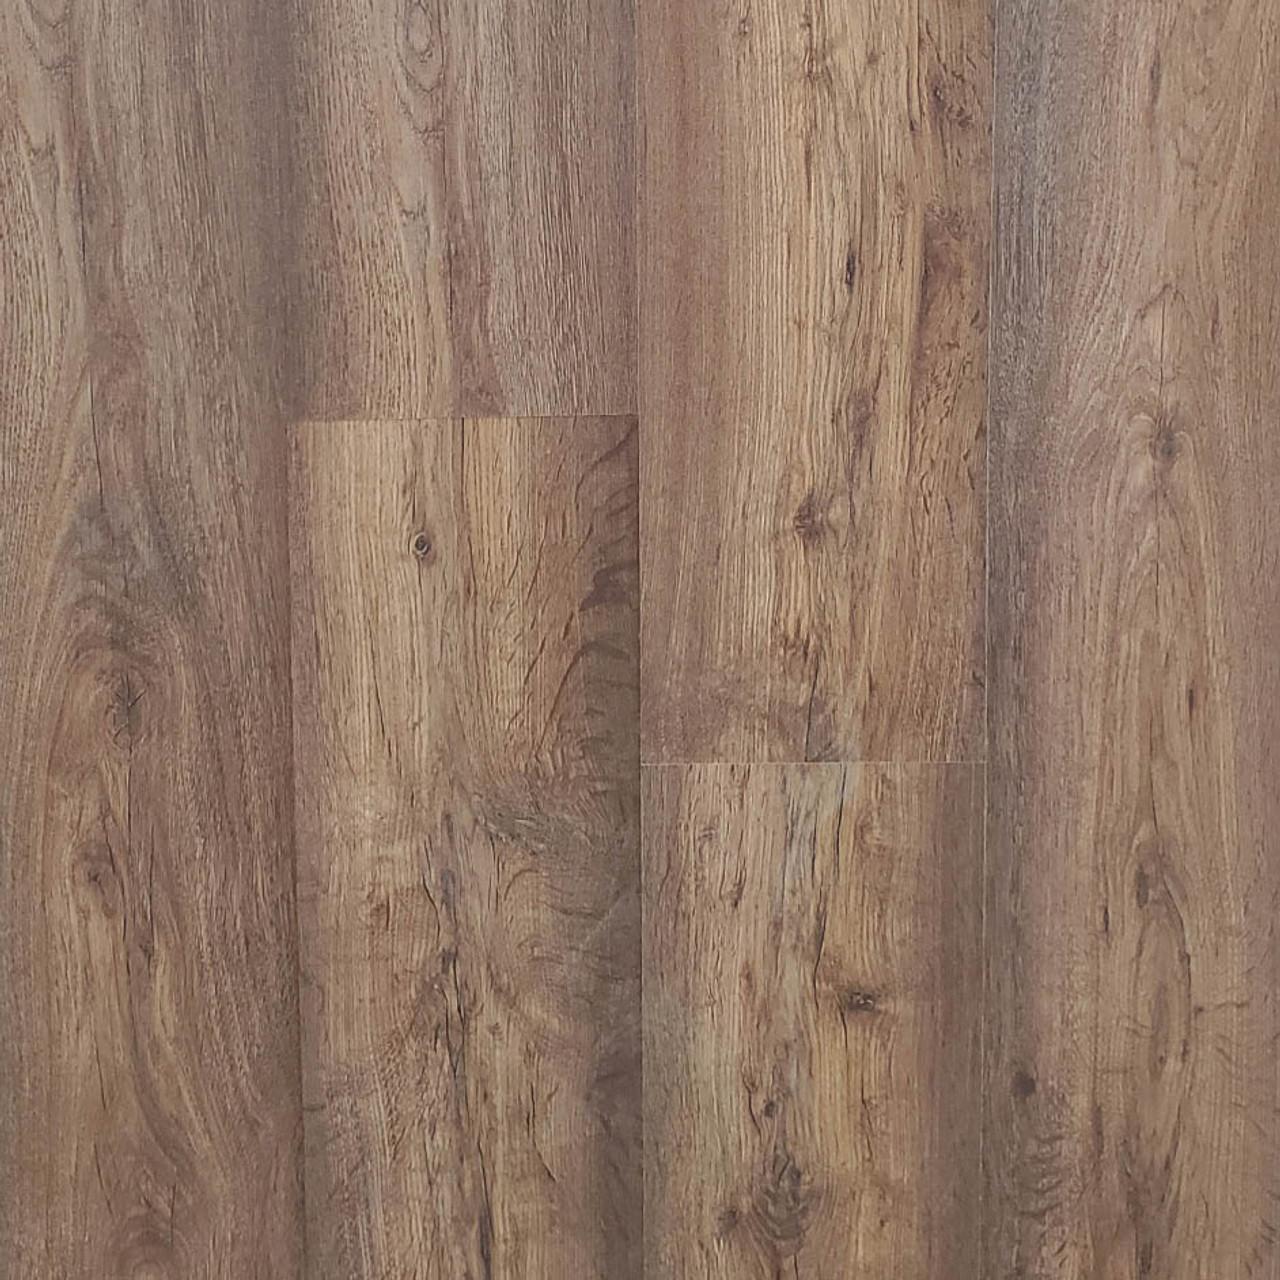 12mm Modena Oak Laminate Flooring   15.93 Sq.Ft. Per Box   Sold by the Box